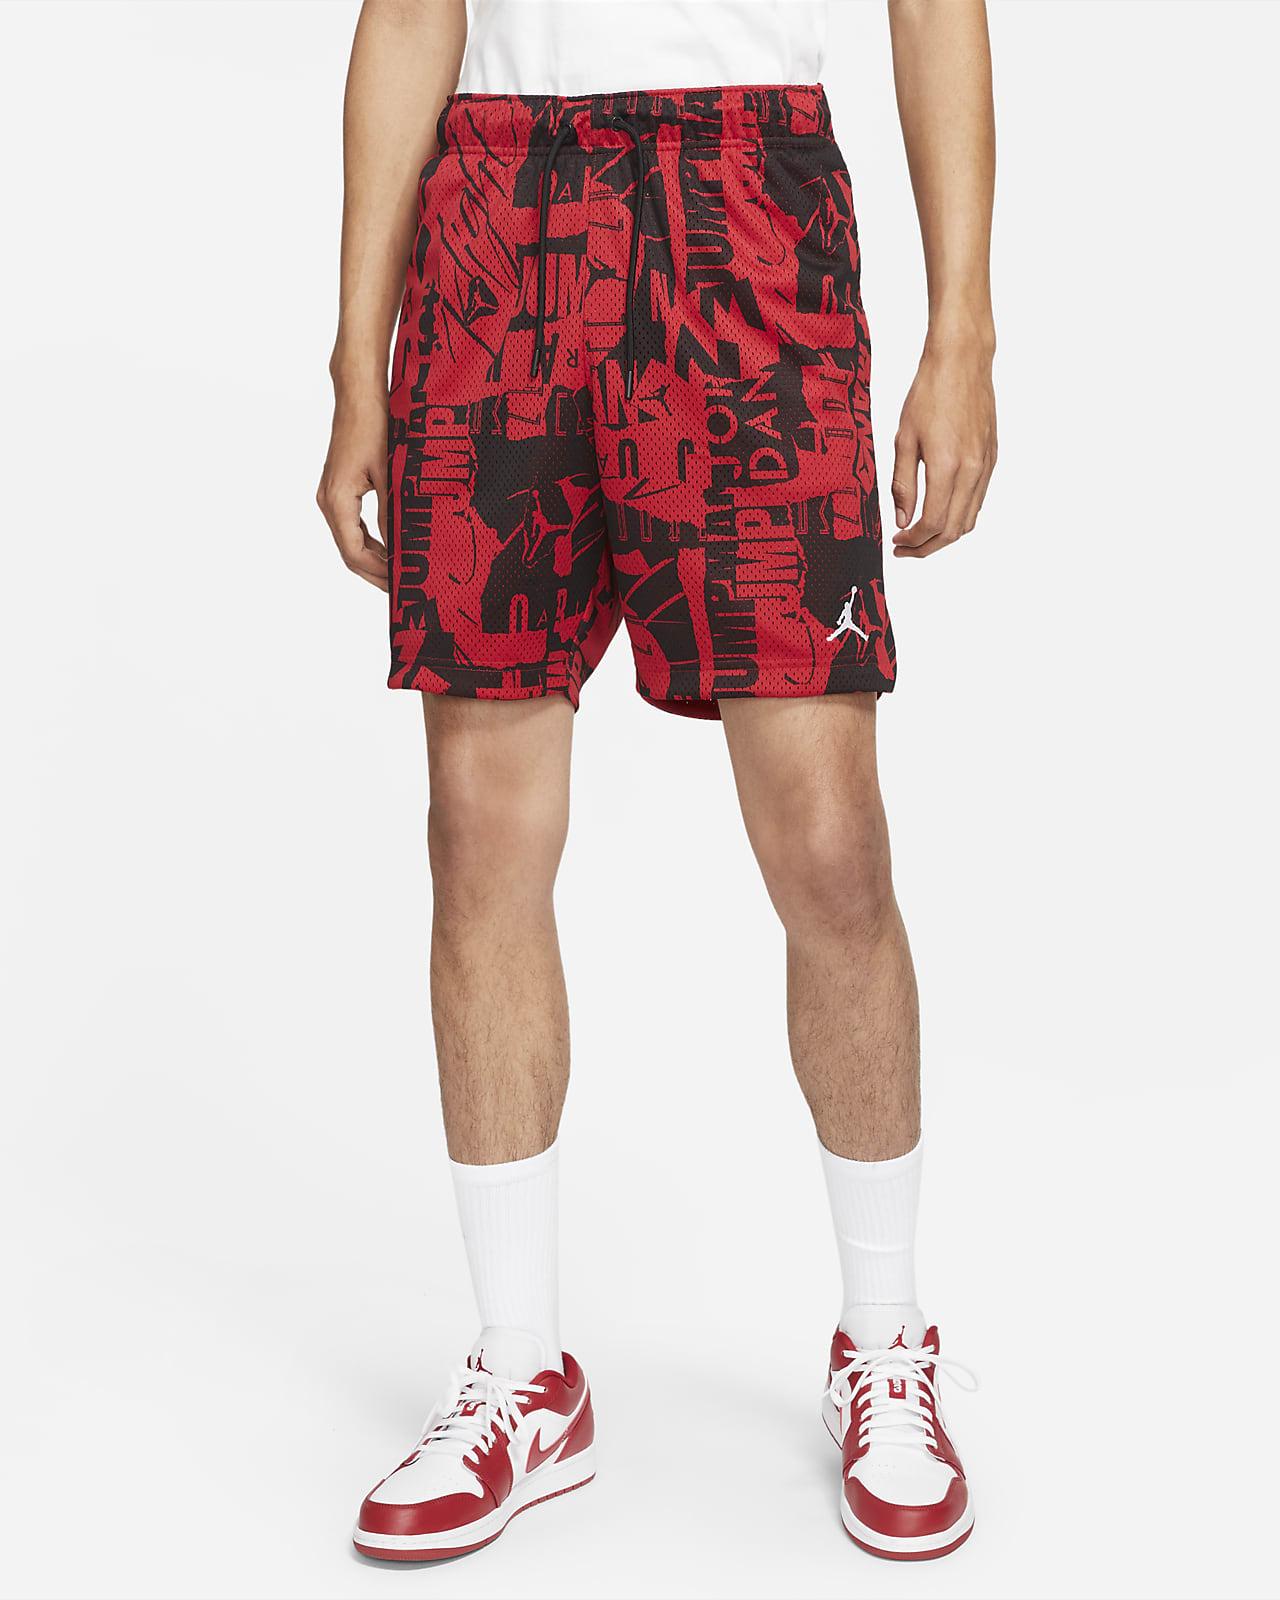 Jordan Essentials Men's Printed Mesh Shorts